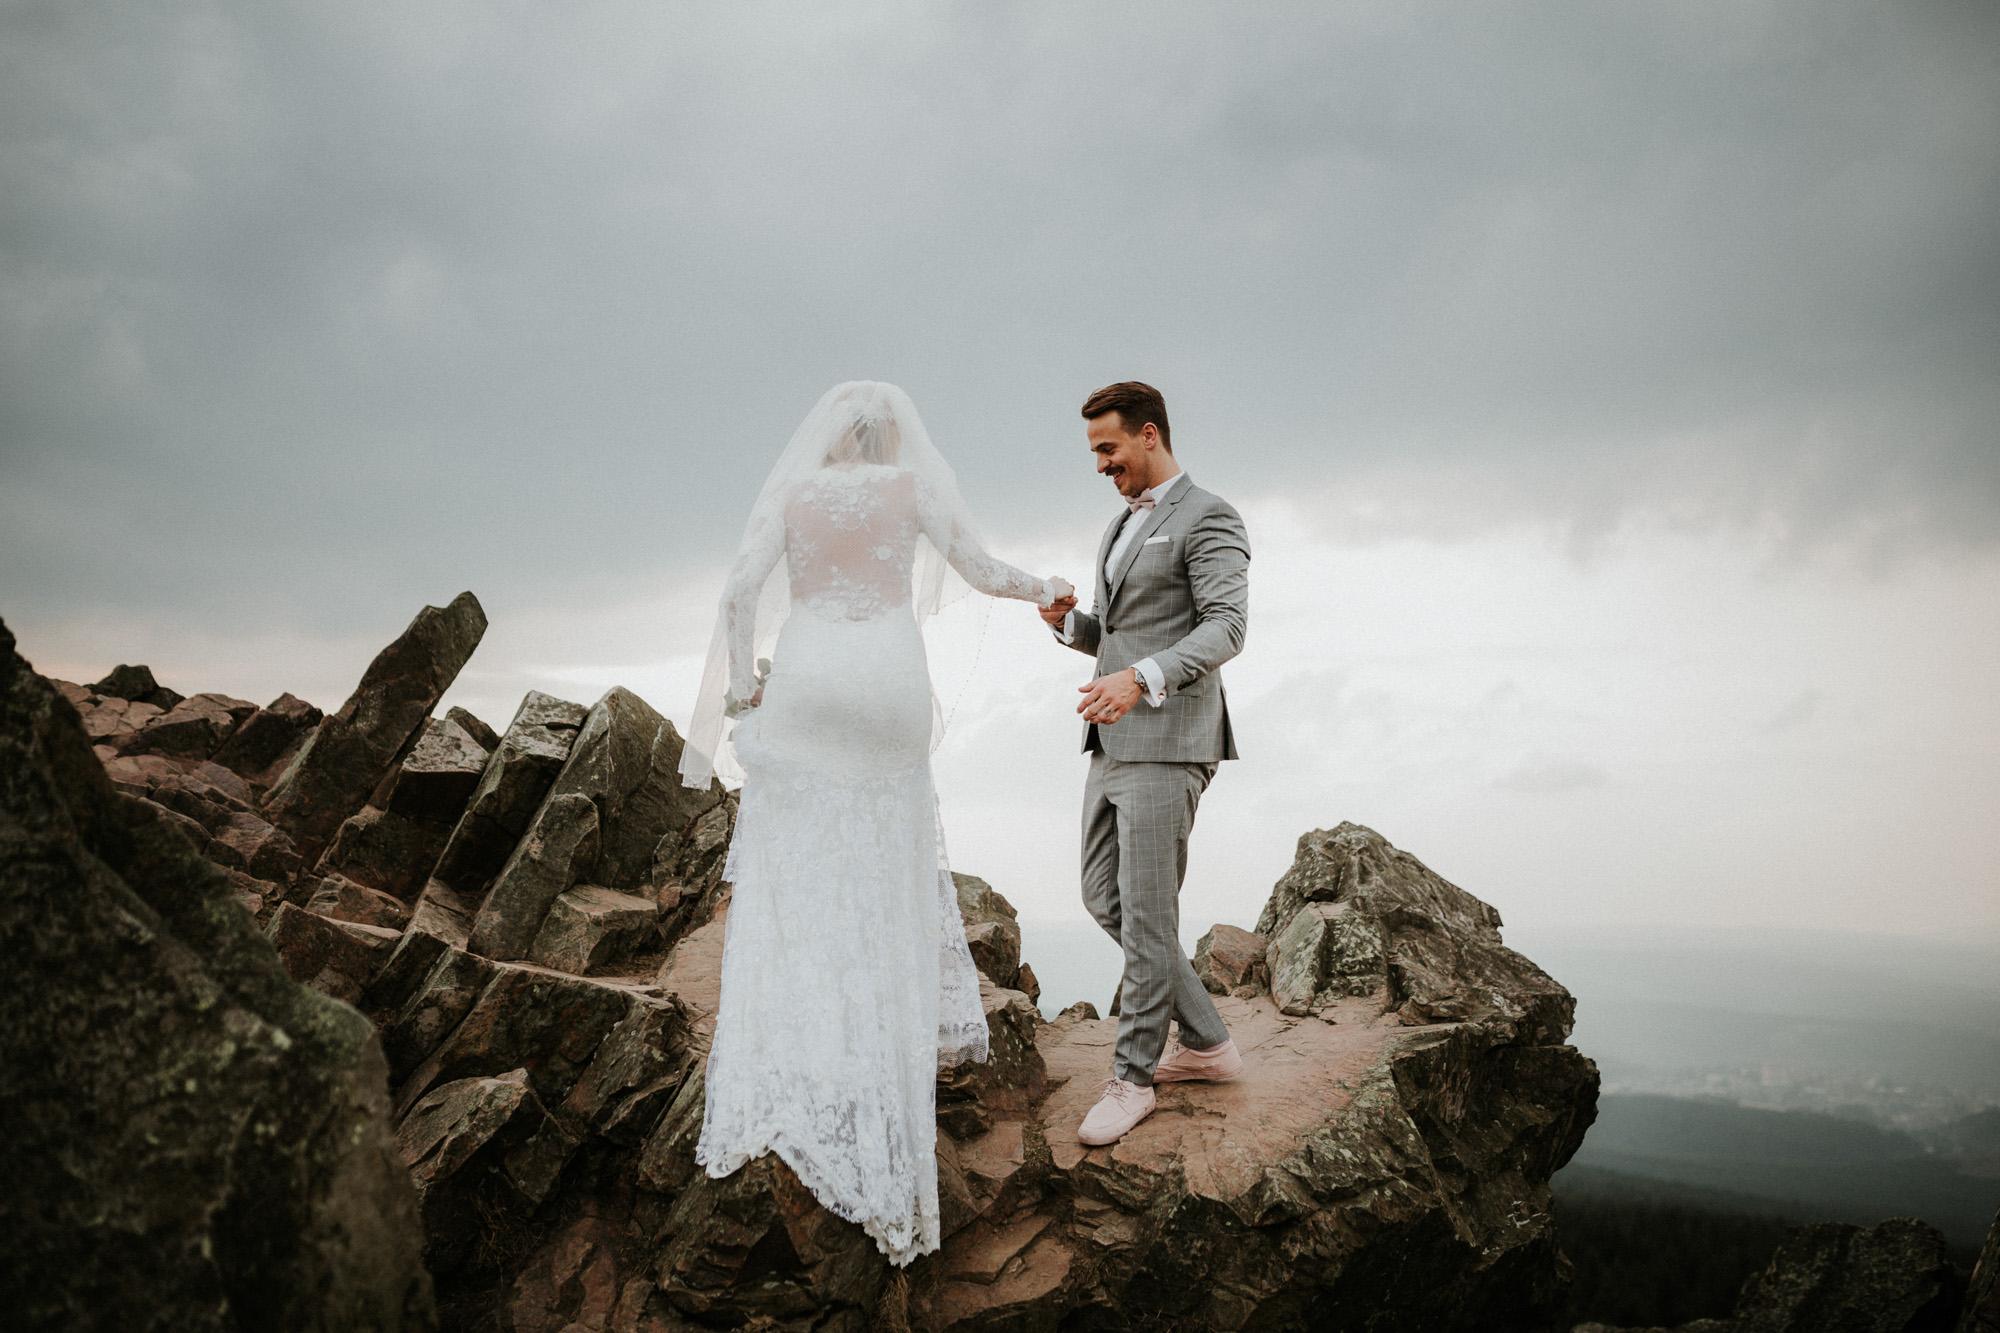 DanielaMarquardtPhotography_Hochzeitsfotograf_Düsseldorf_Köln_Mallorca_Bayern_Austria_Harz_LinaundMaik_Afterwedding-Shooting_Weddingphotographer_Ibiza_Tuskany_Italien_Toskana8